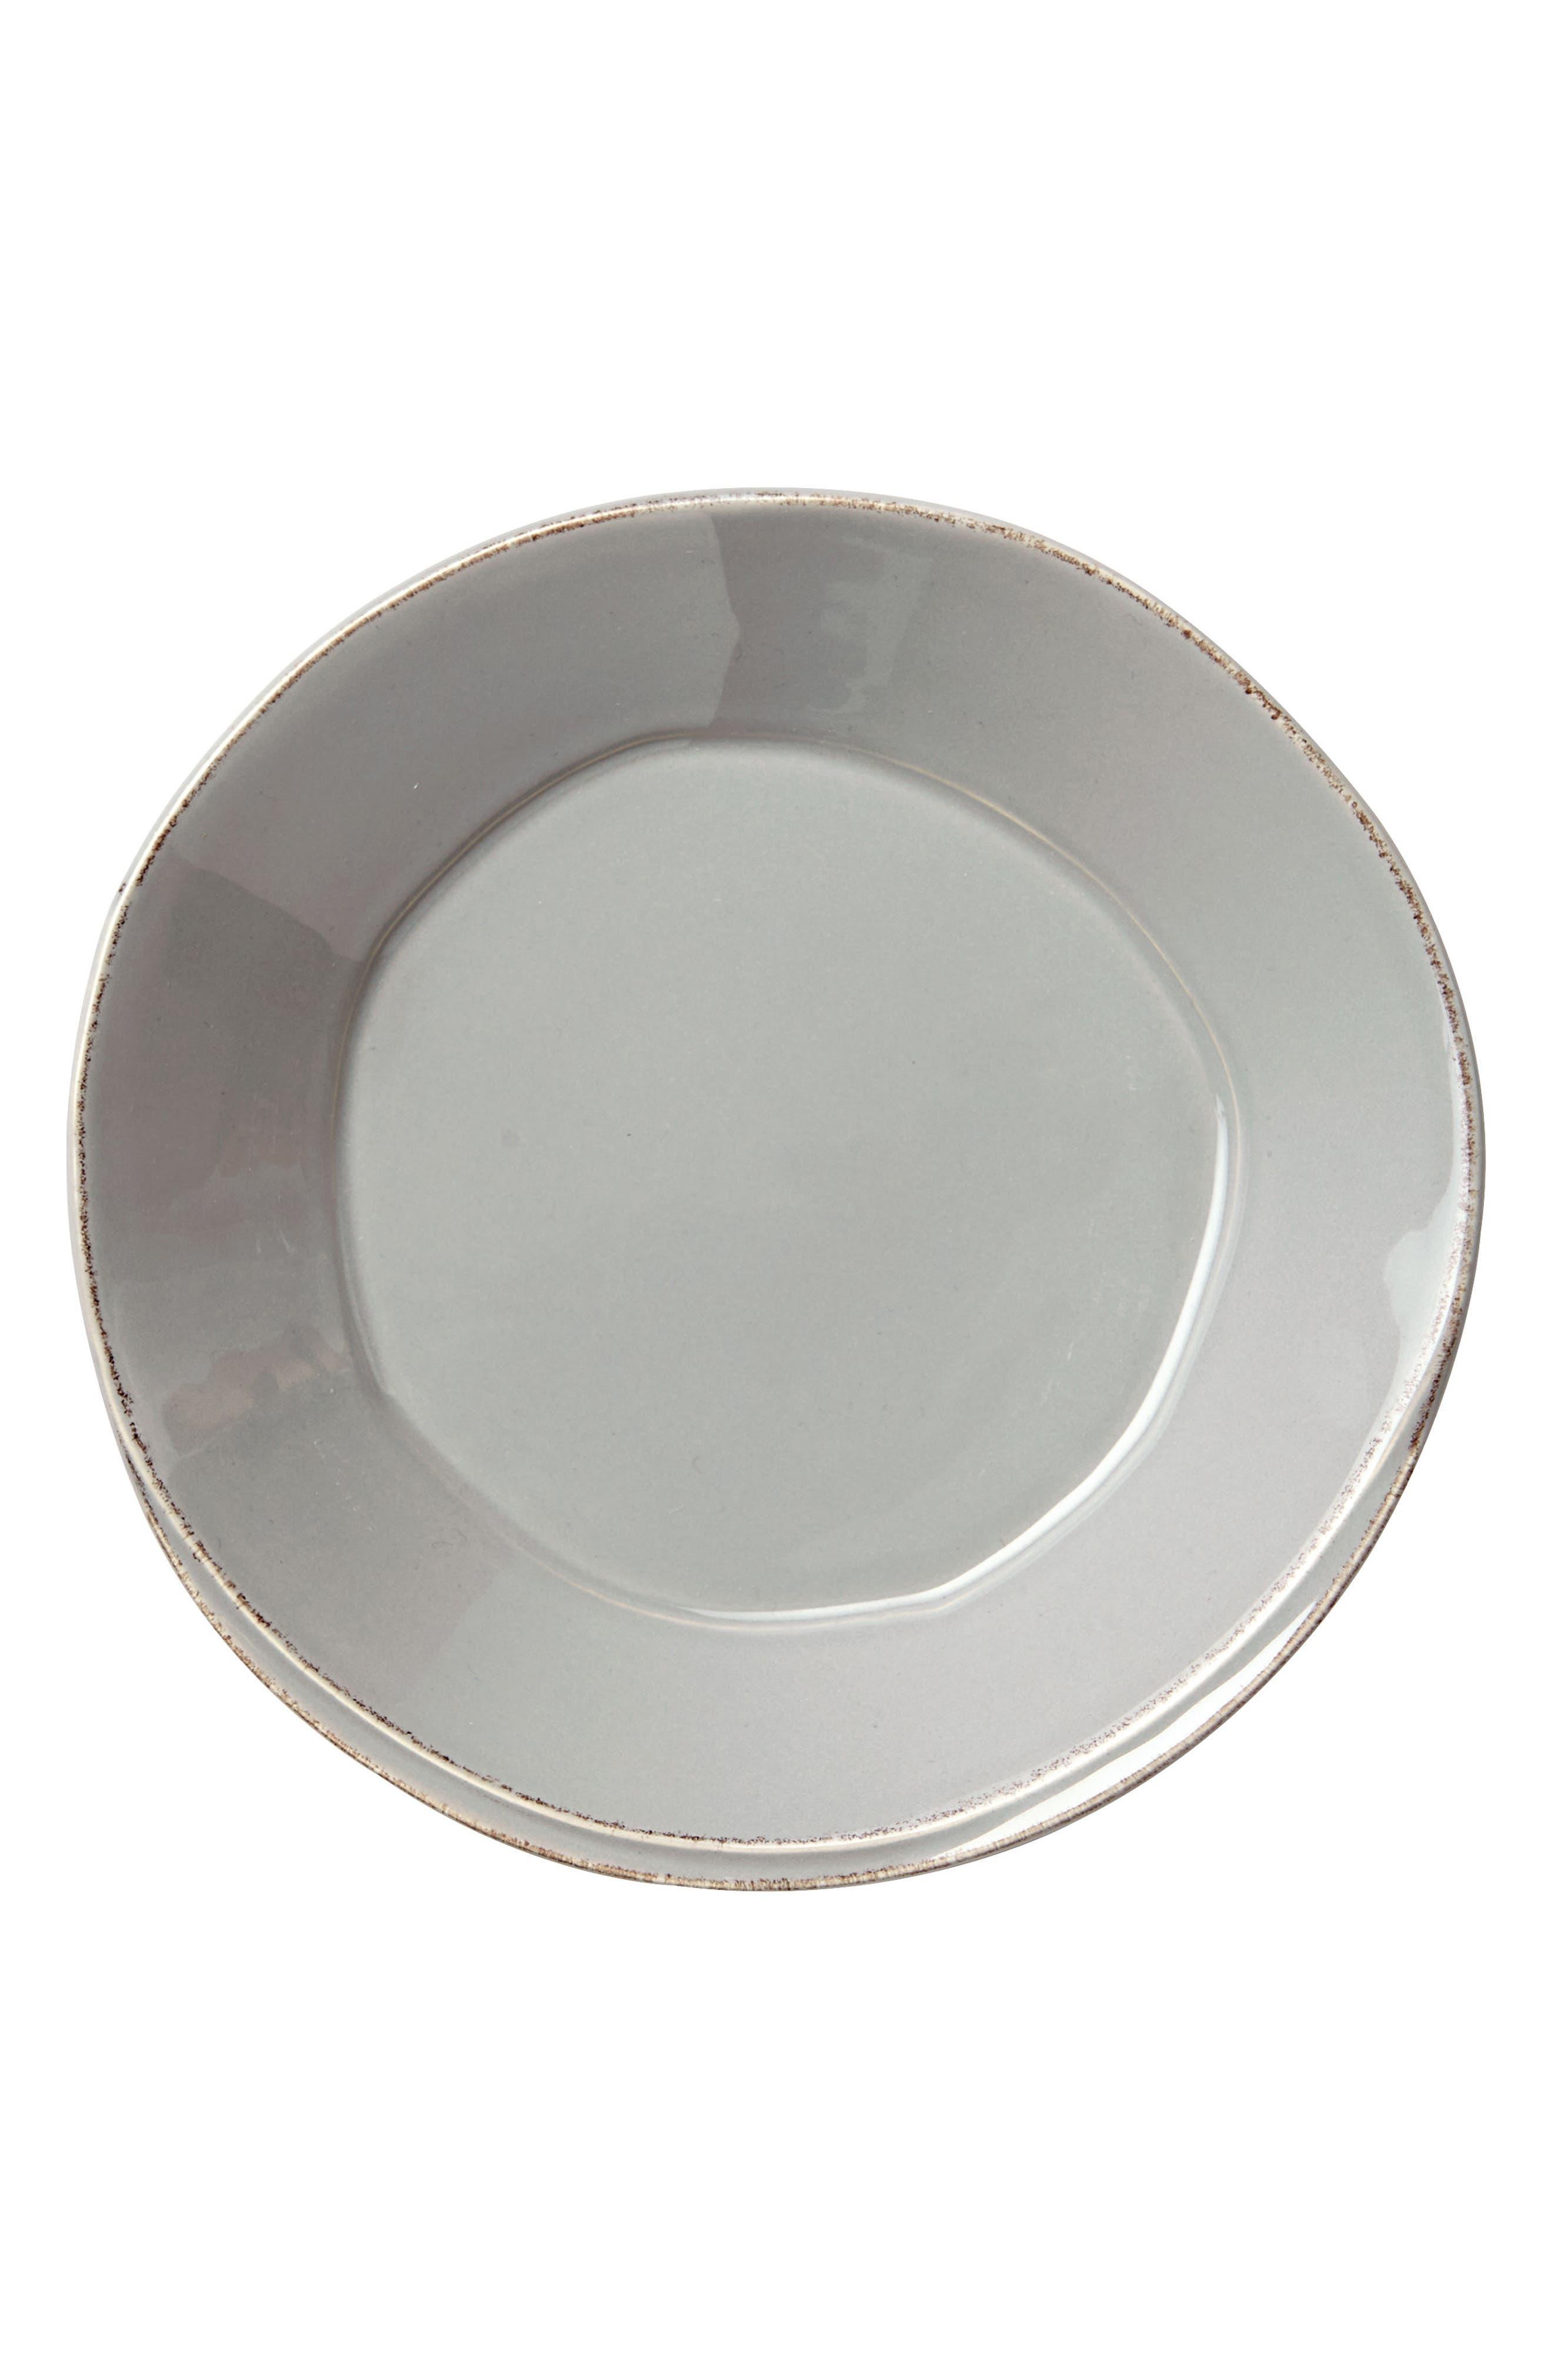 VIETRA Lastra Pasta Bowl,                         Main,                         color, Gray